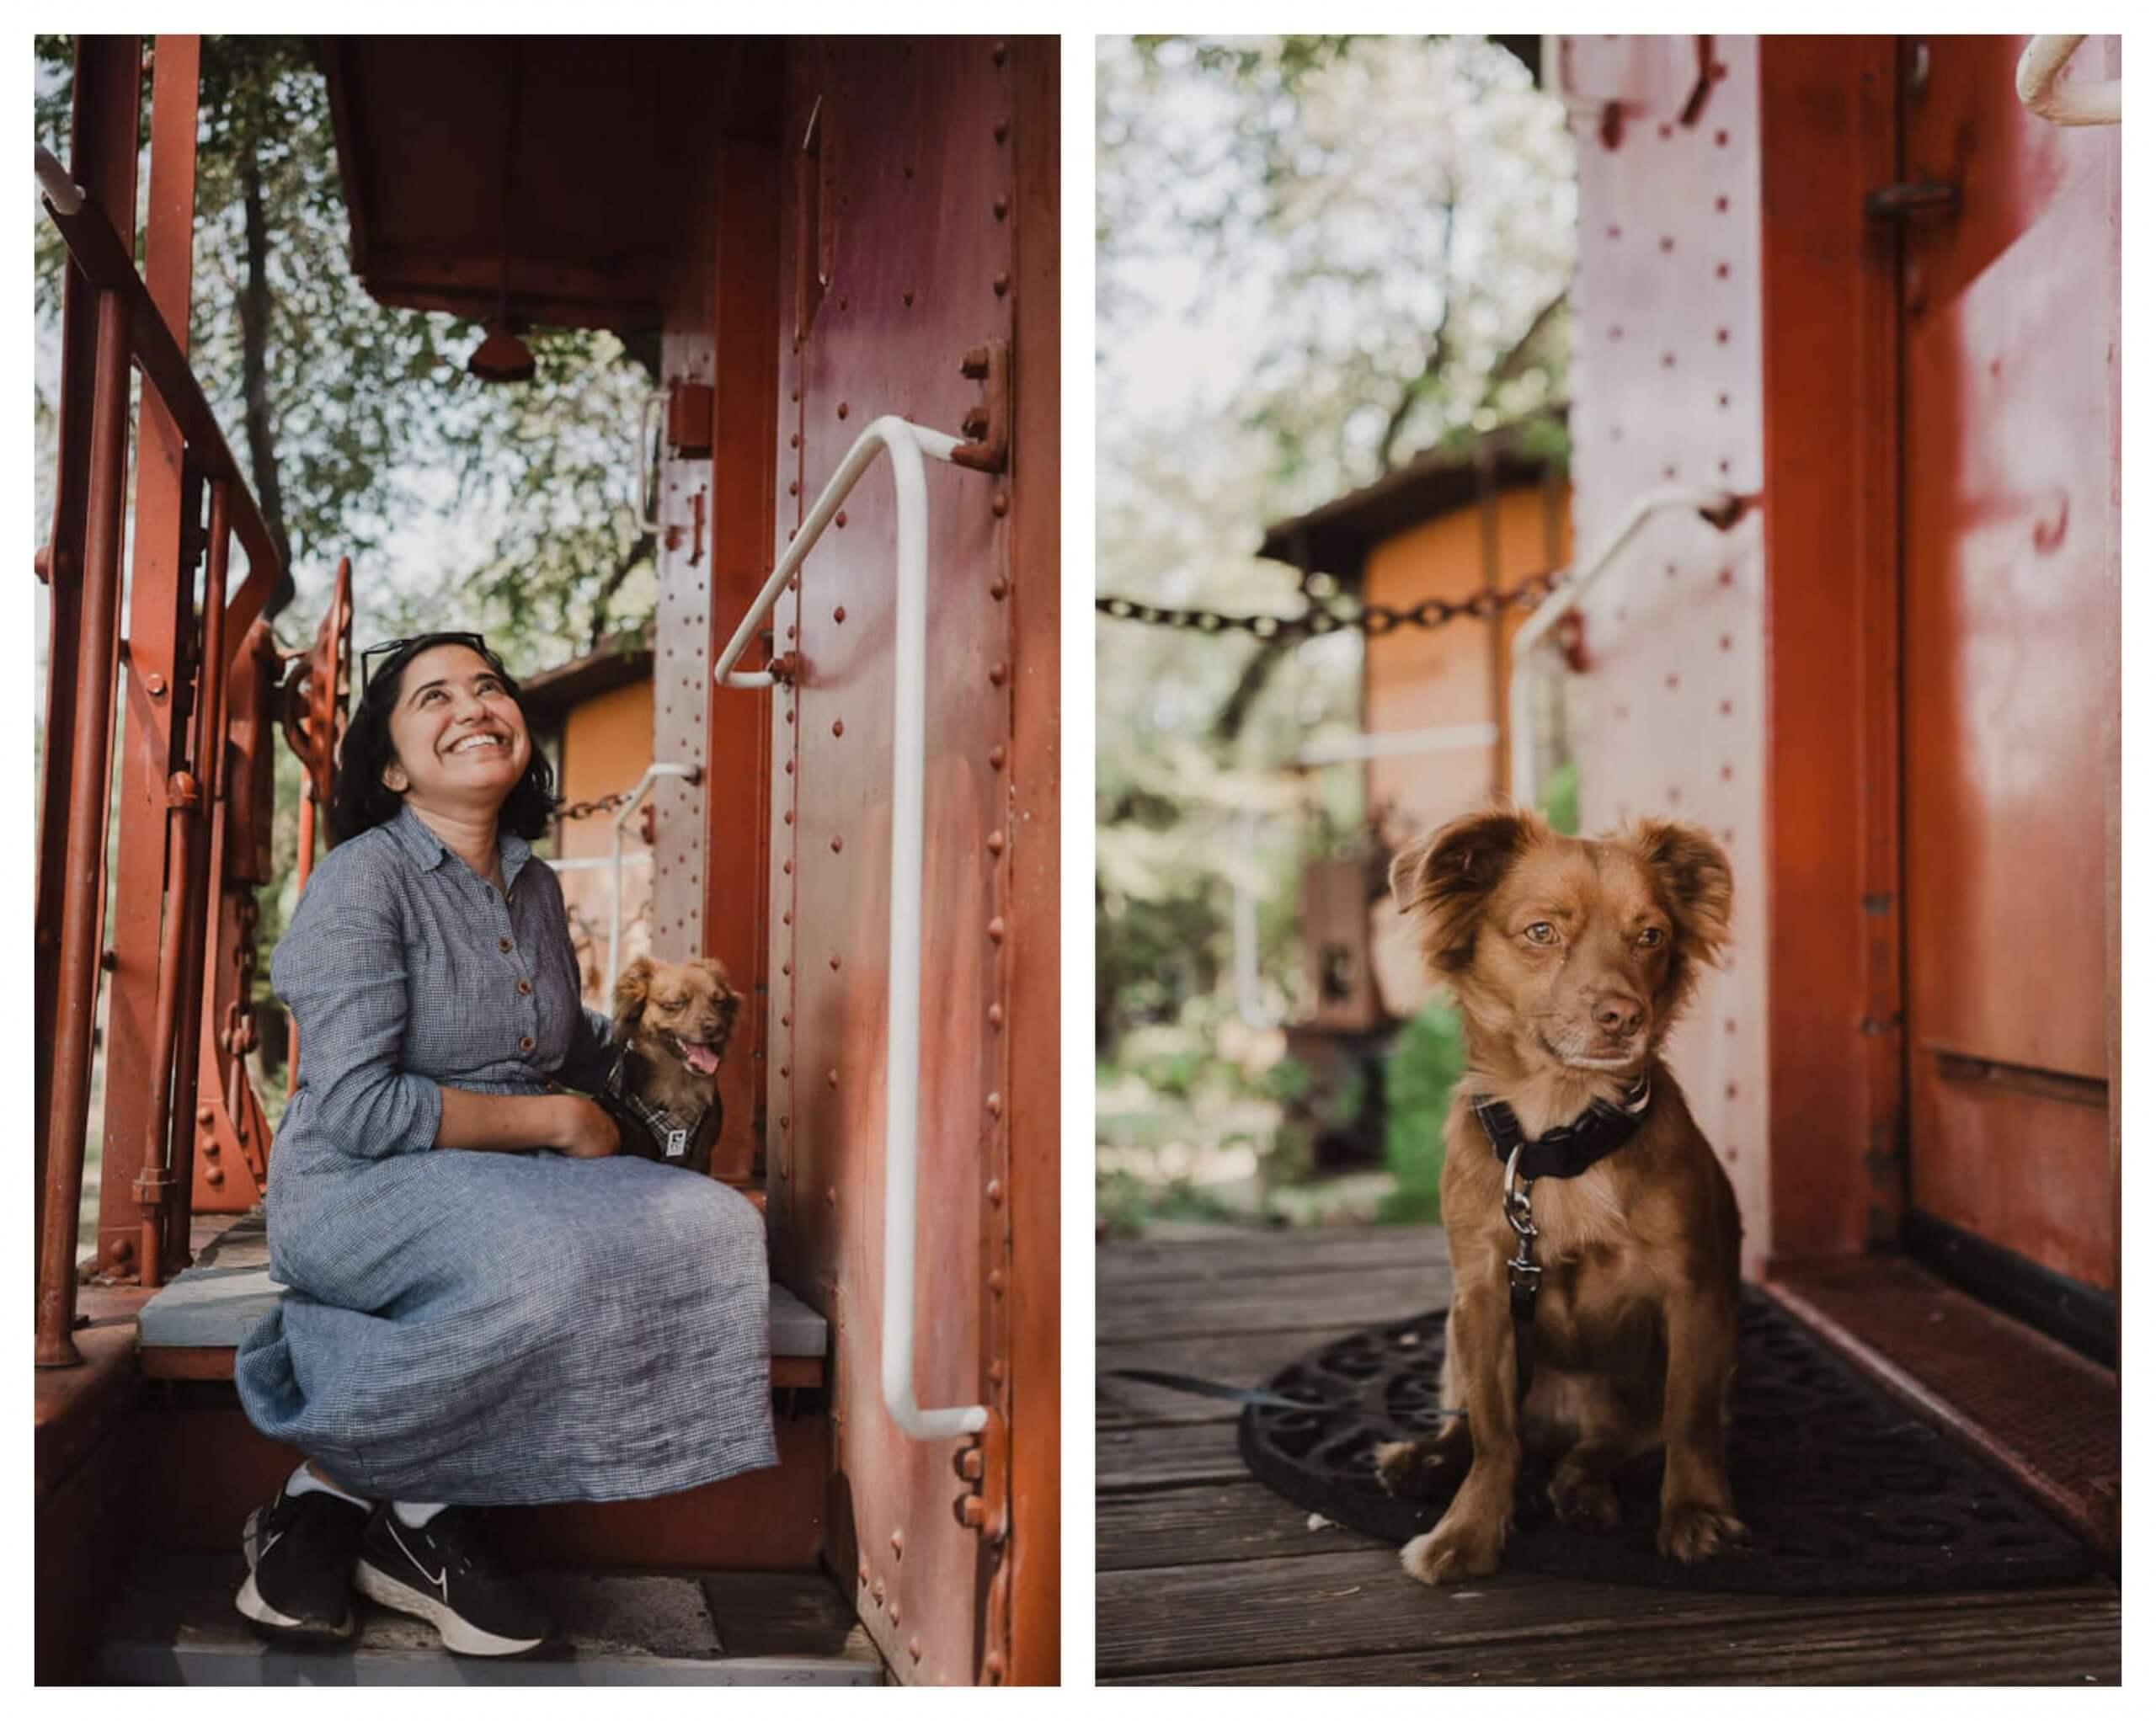 Dog friendly B&B Featherbed railroad Caboose